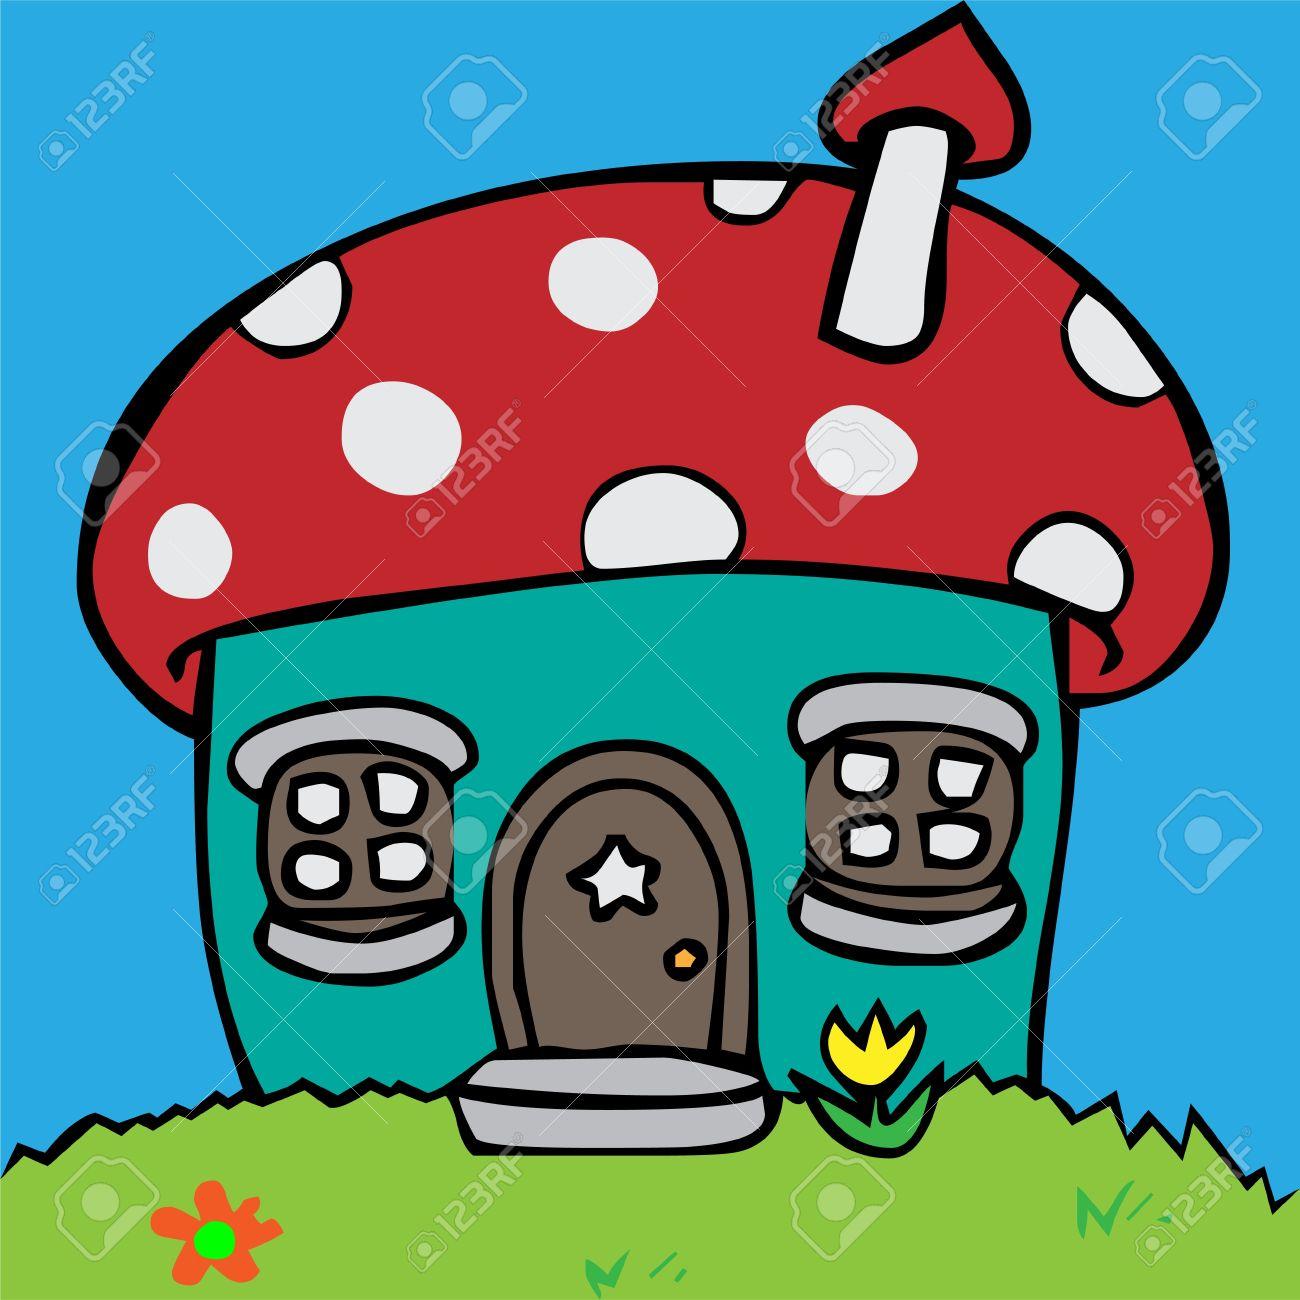 Cartoon Vector Illustration Of A House In Mushroom Shape Royalty.